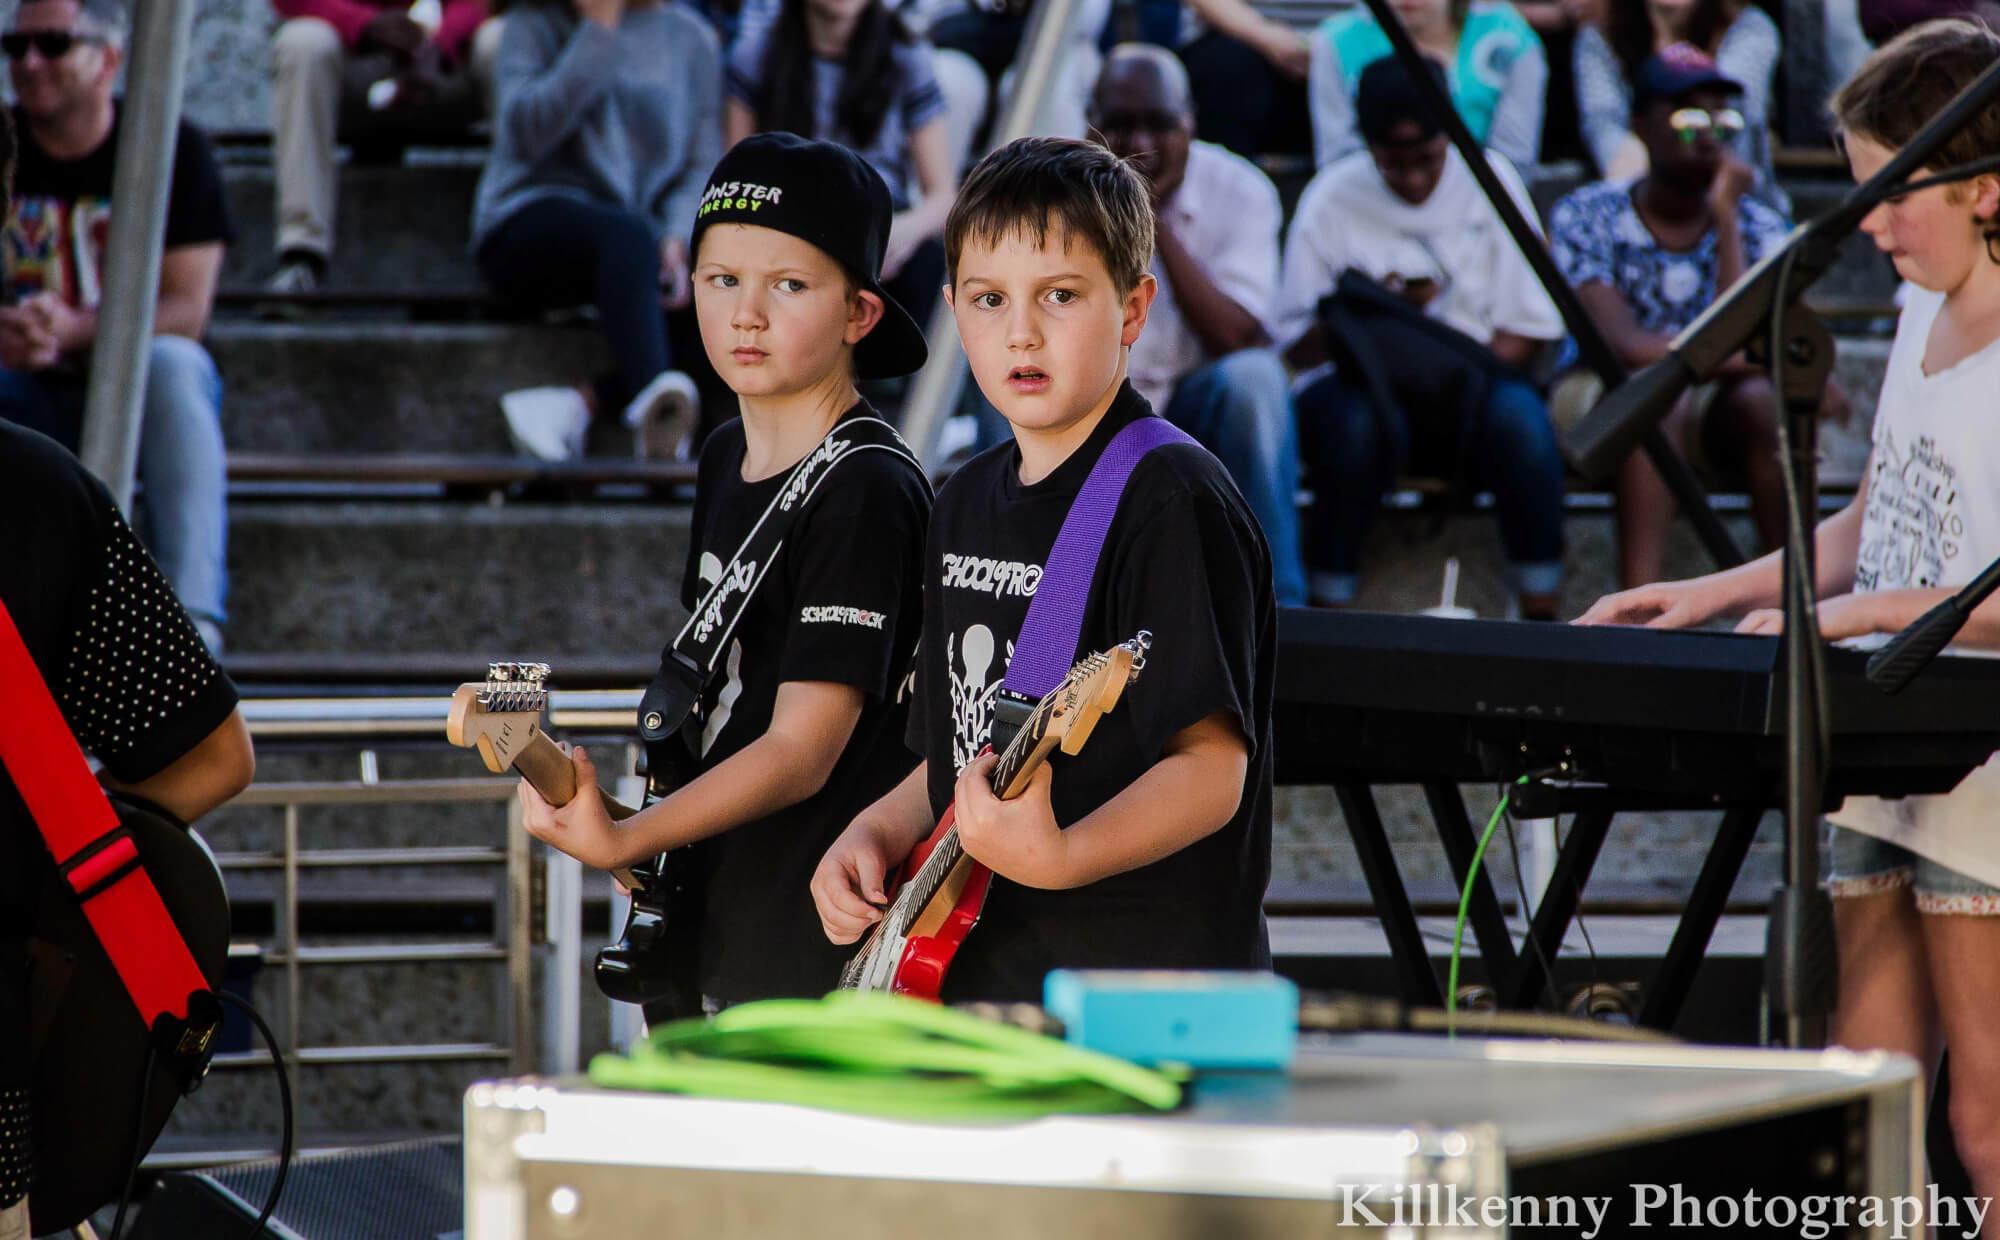 Rock 101 students performing at the V&A Waterfront Amphitheatre - 27 November 2015